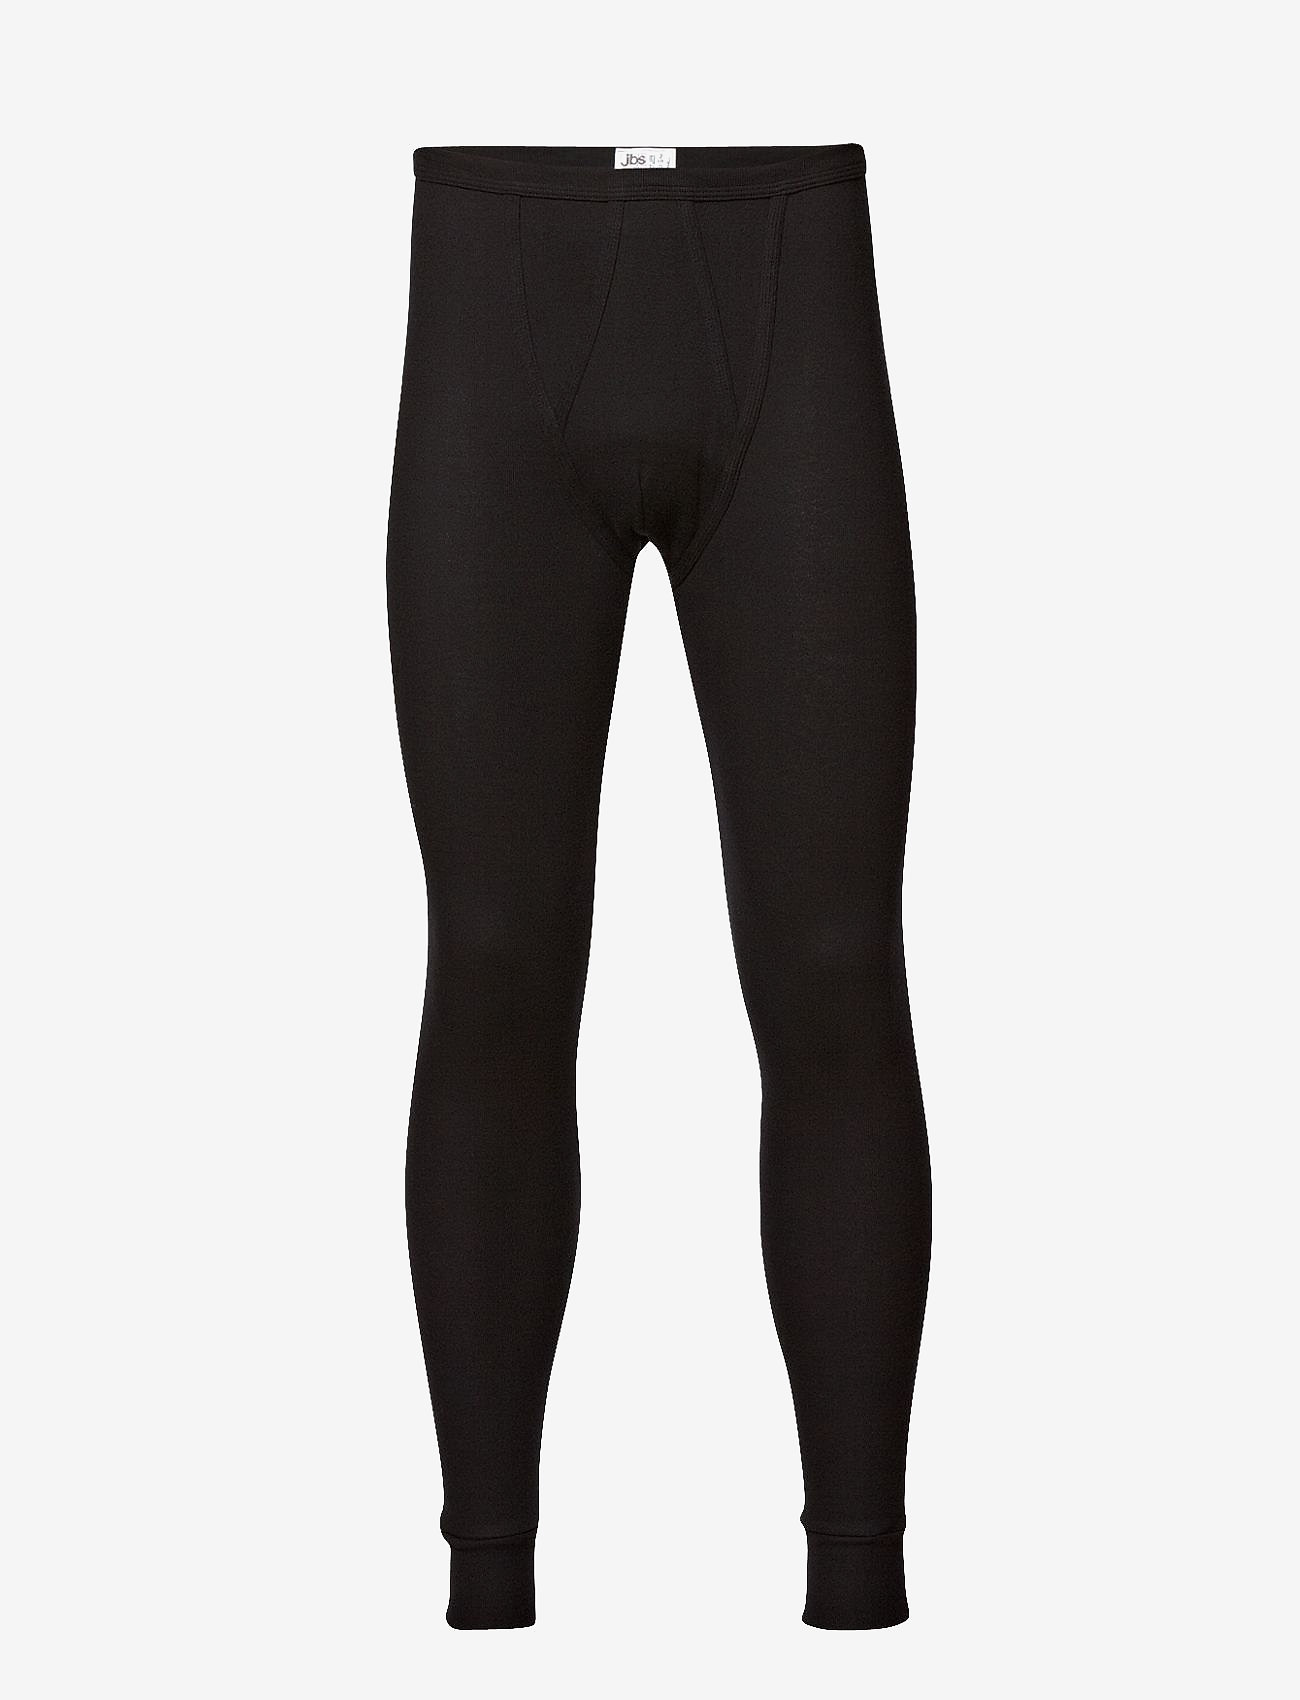 JBS - Original long legs - lange unterhosen - white - 0